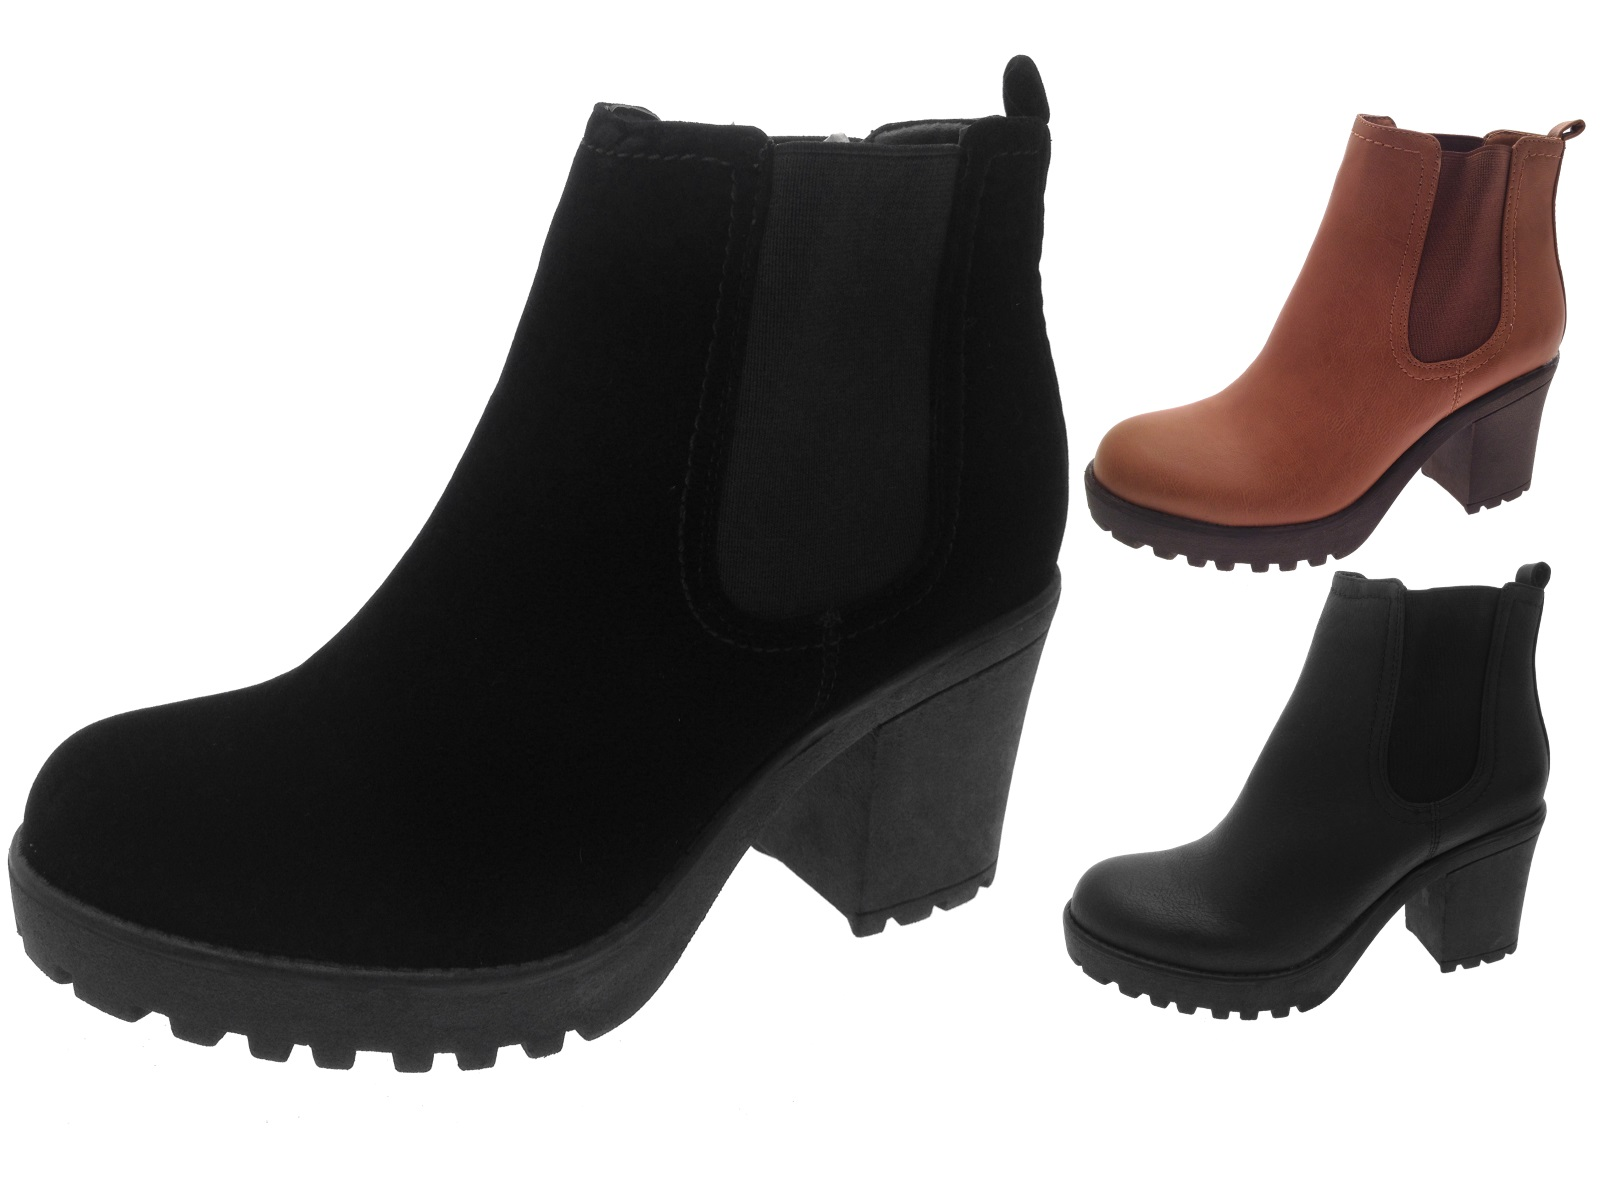 8370d83629b5 Womens Mid Chunky Block Heel Chelsea Low Ankle Boots Platform Ladies ...